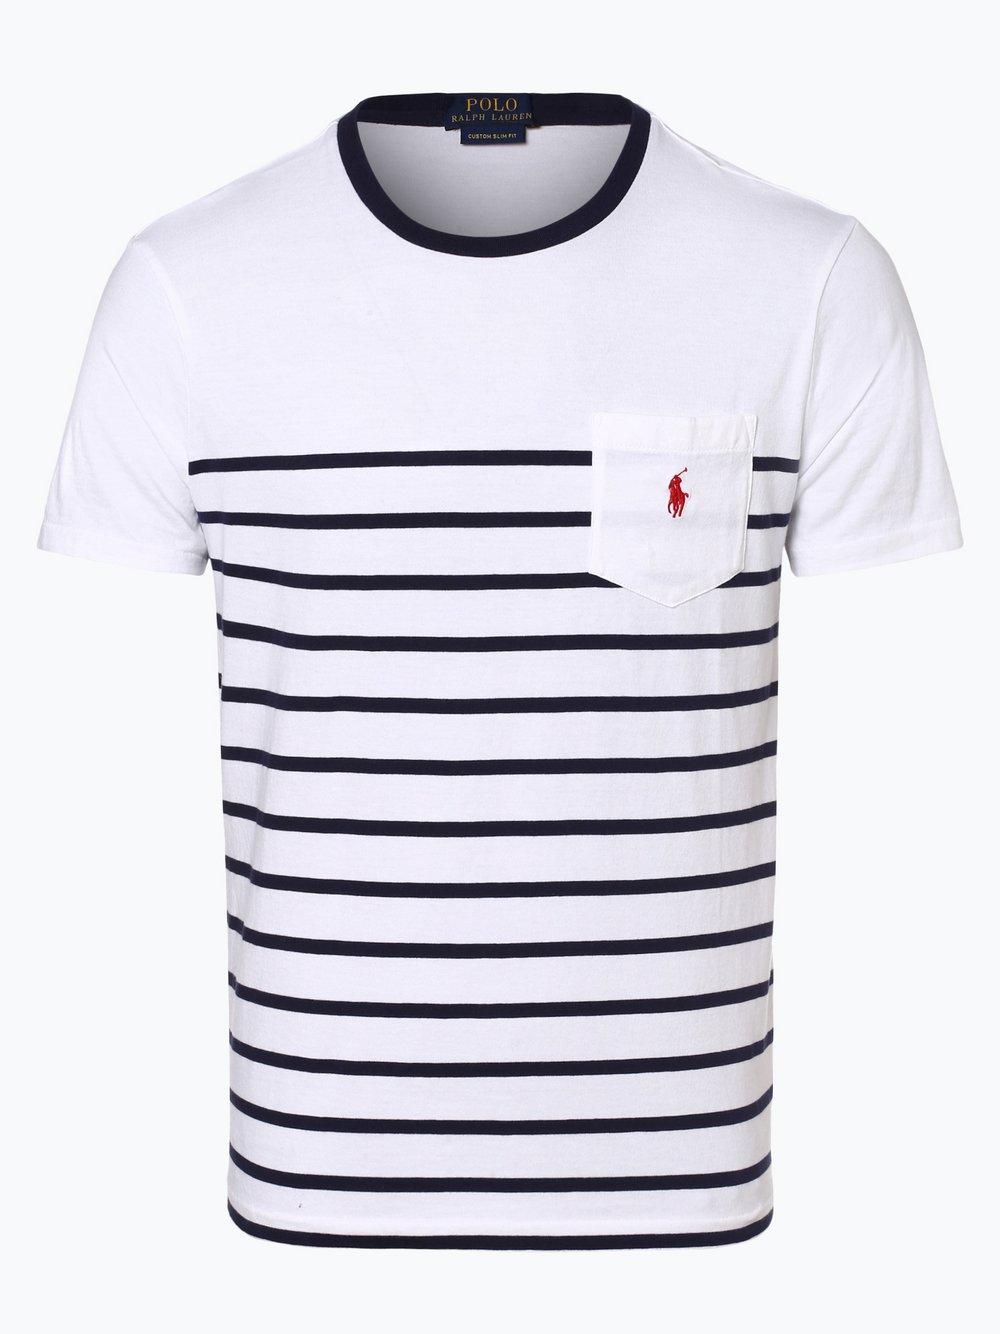 premium selection 65c5b 2e682 Polo Ralph Lauren Herren T-Shirt - Custom Slim Fit online ...